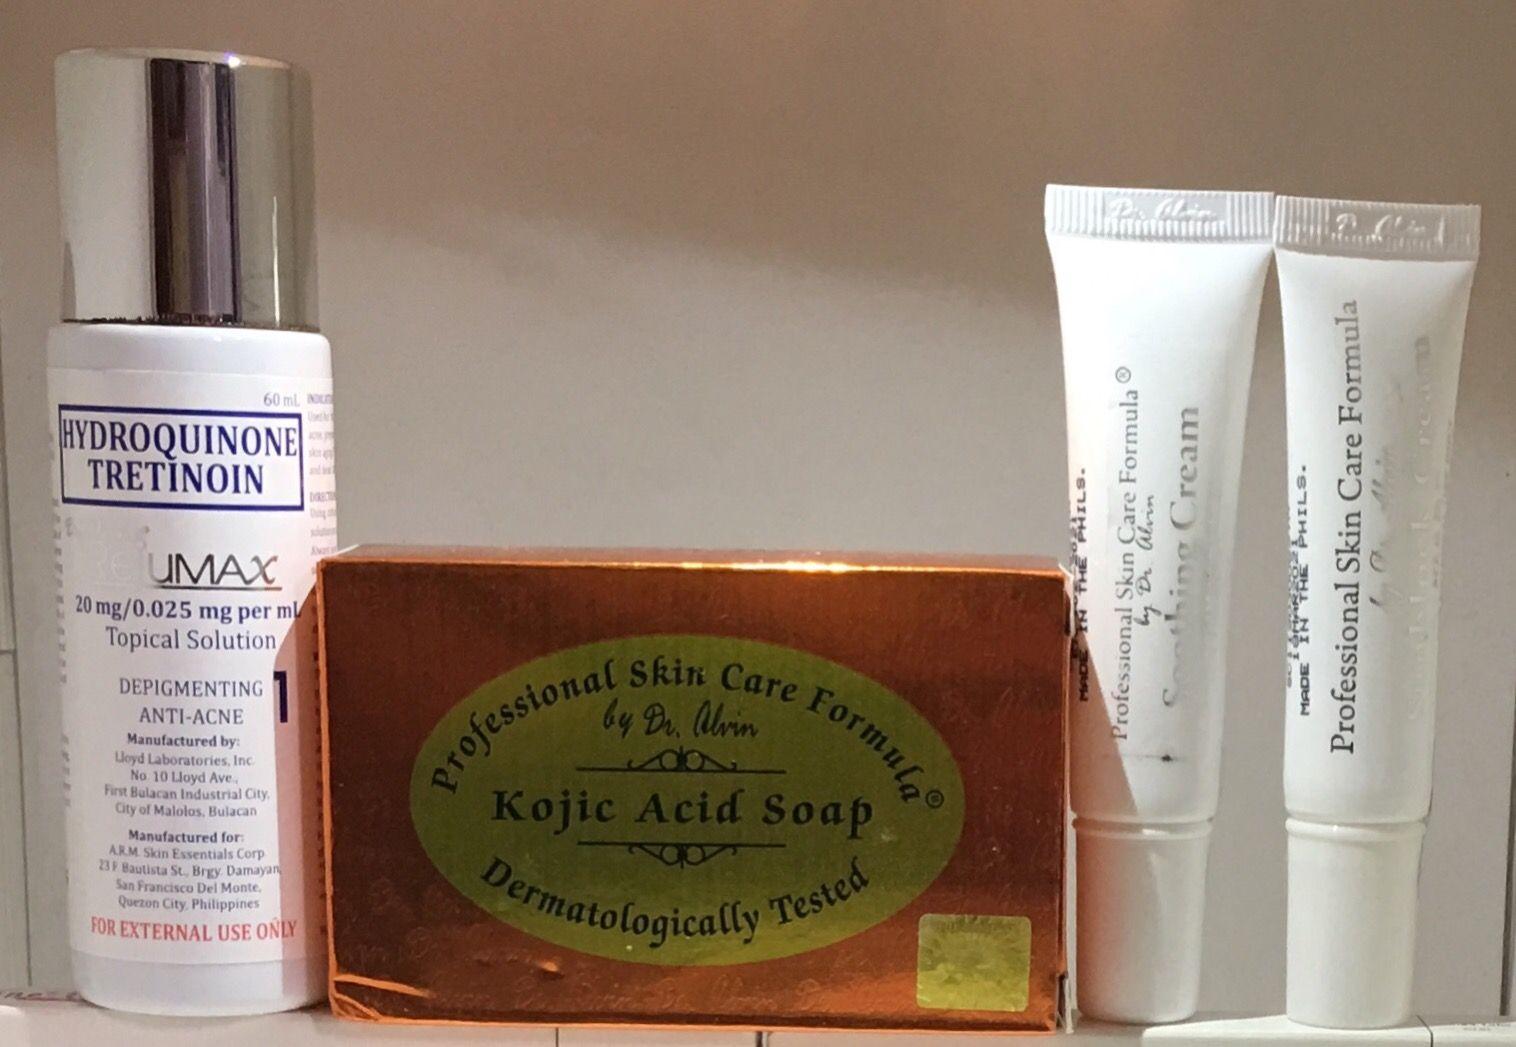 Dr Alvin Rejumax Set Program 1 Rejumax Program 1 The Starter Kit Can Treat Mild Acne Promotes Mi Pimple Marks Professional Skin Care Products Mild Acne